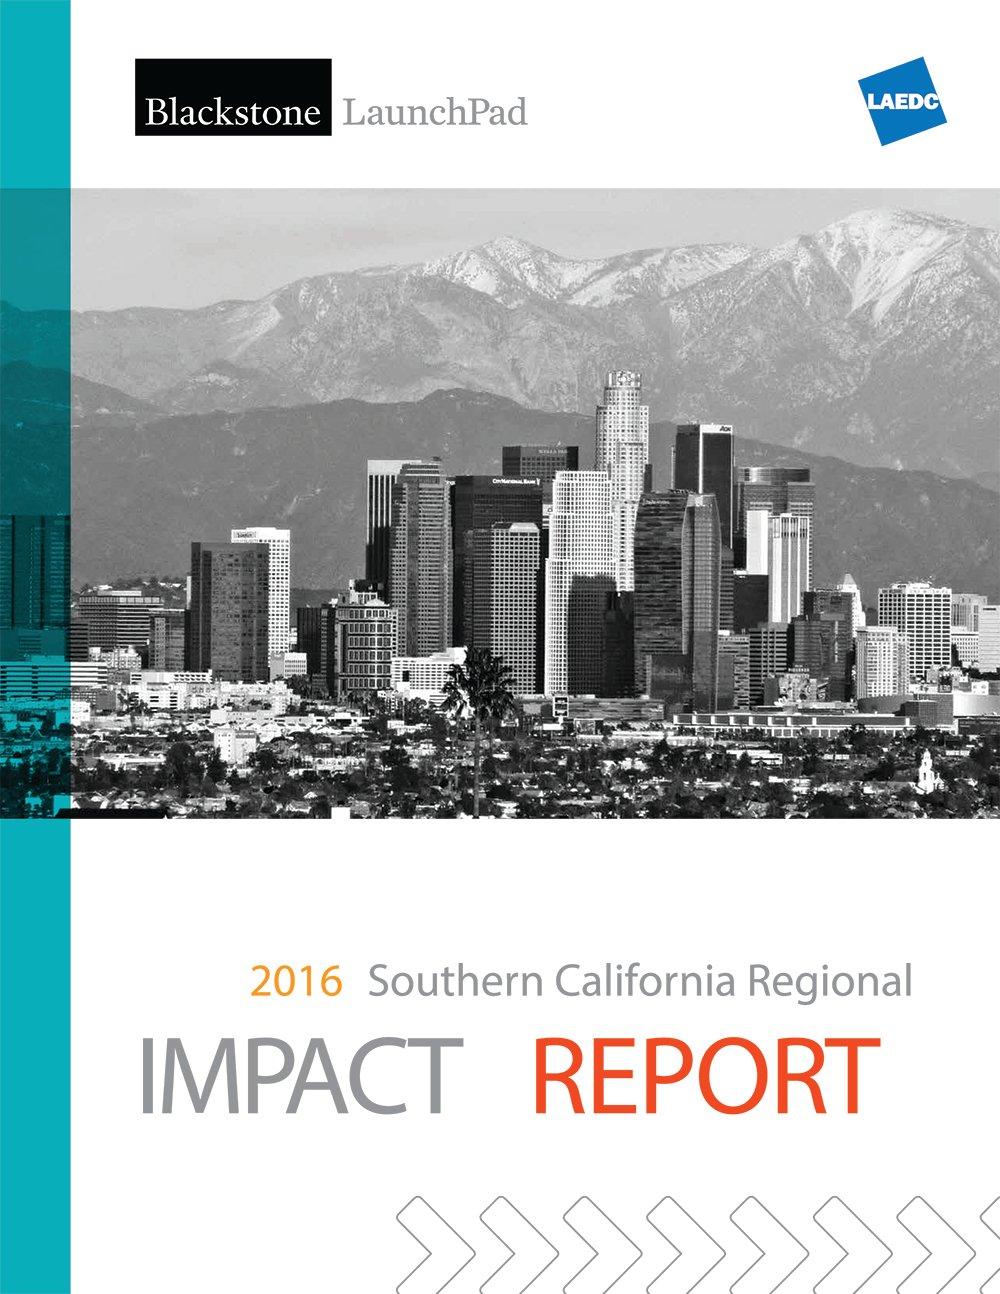 Blackstone LaunchPad Impact Report